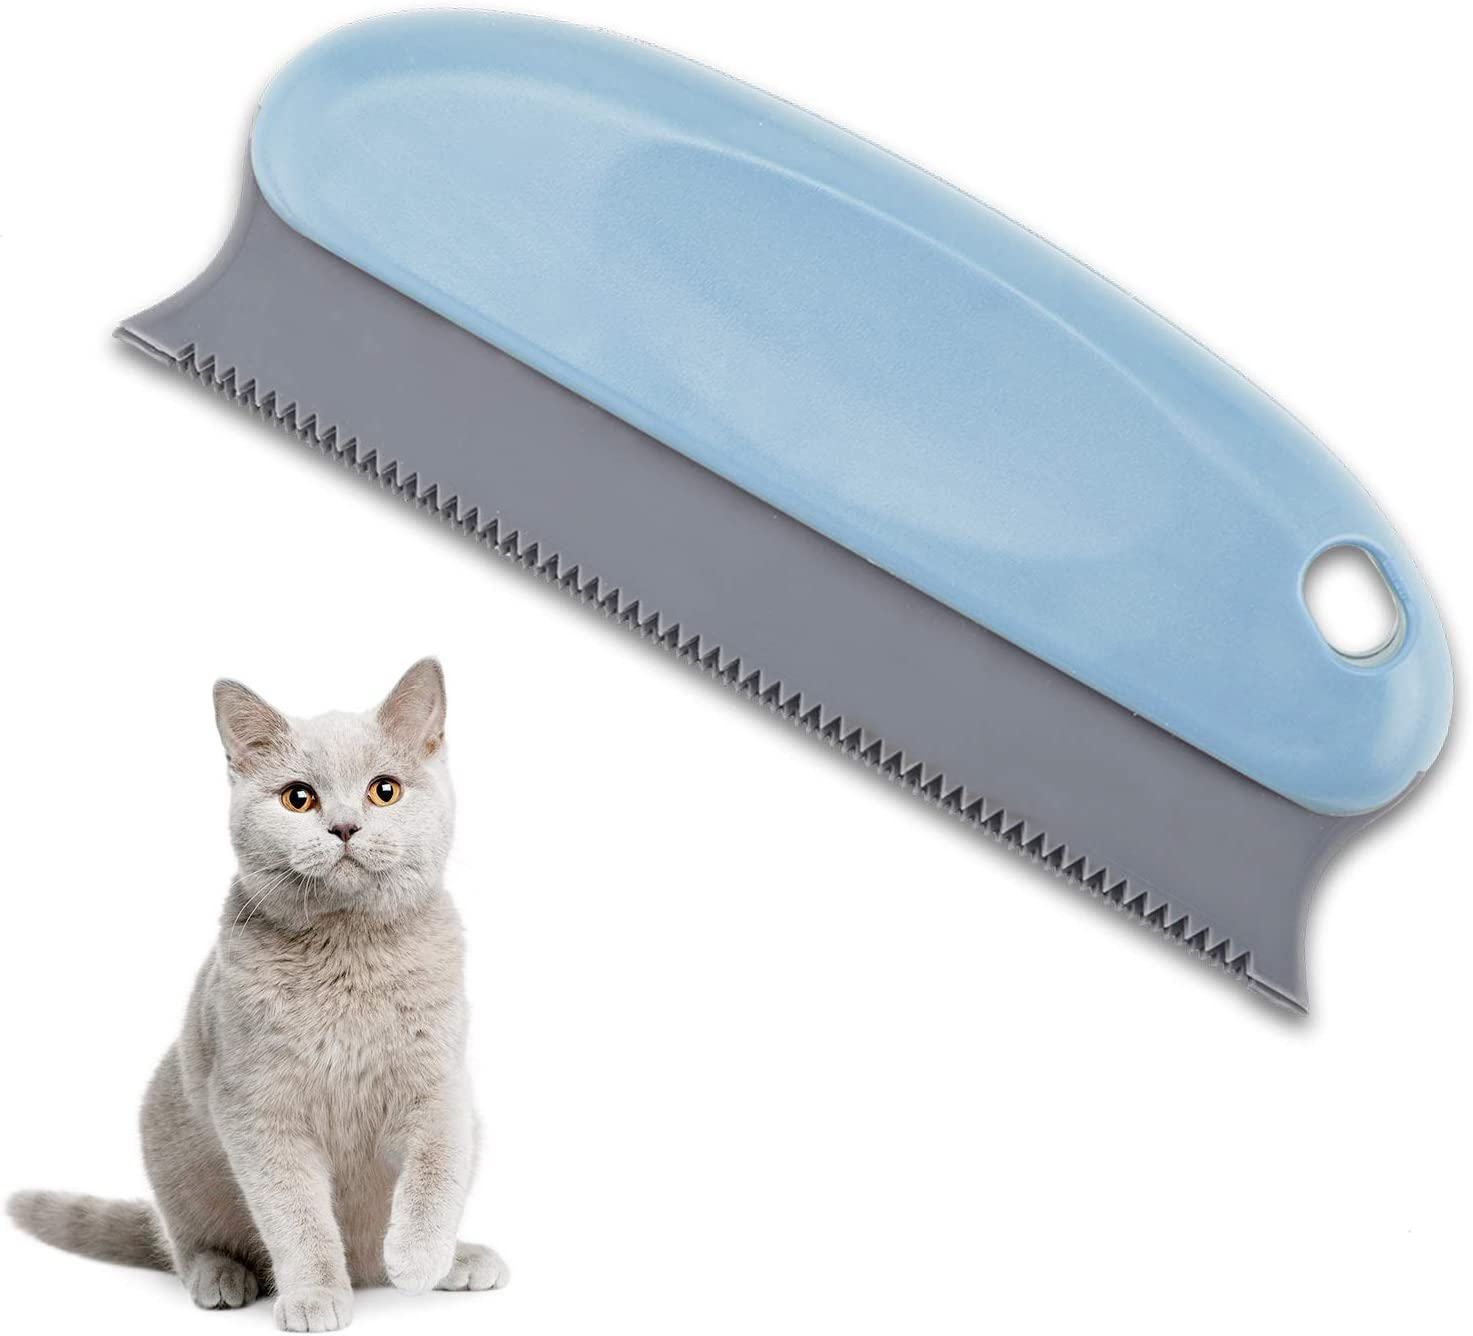 Auidy_6TXD Pet Hair Remover Brush - Lint Brush - Fur Remover - Dog & Cat Hair Remover for Couch, Furniture, Carpet, Clothing, Blankets, Car, Bed